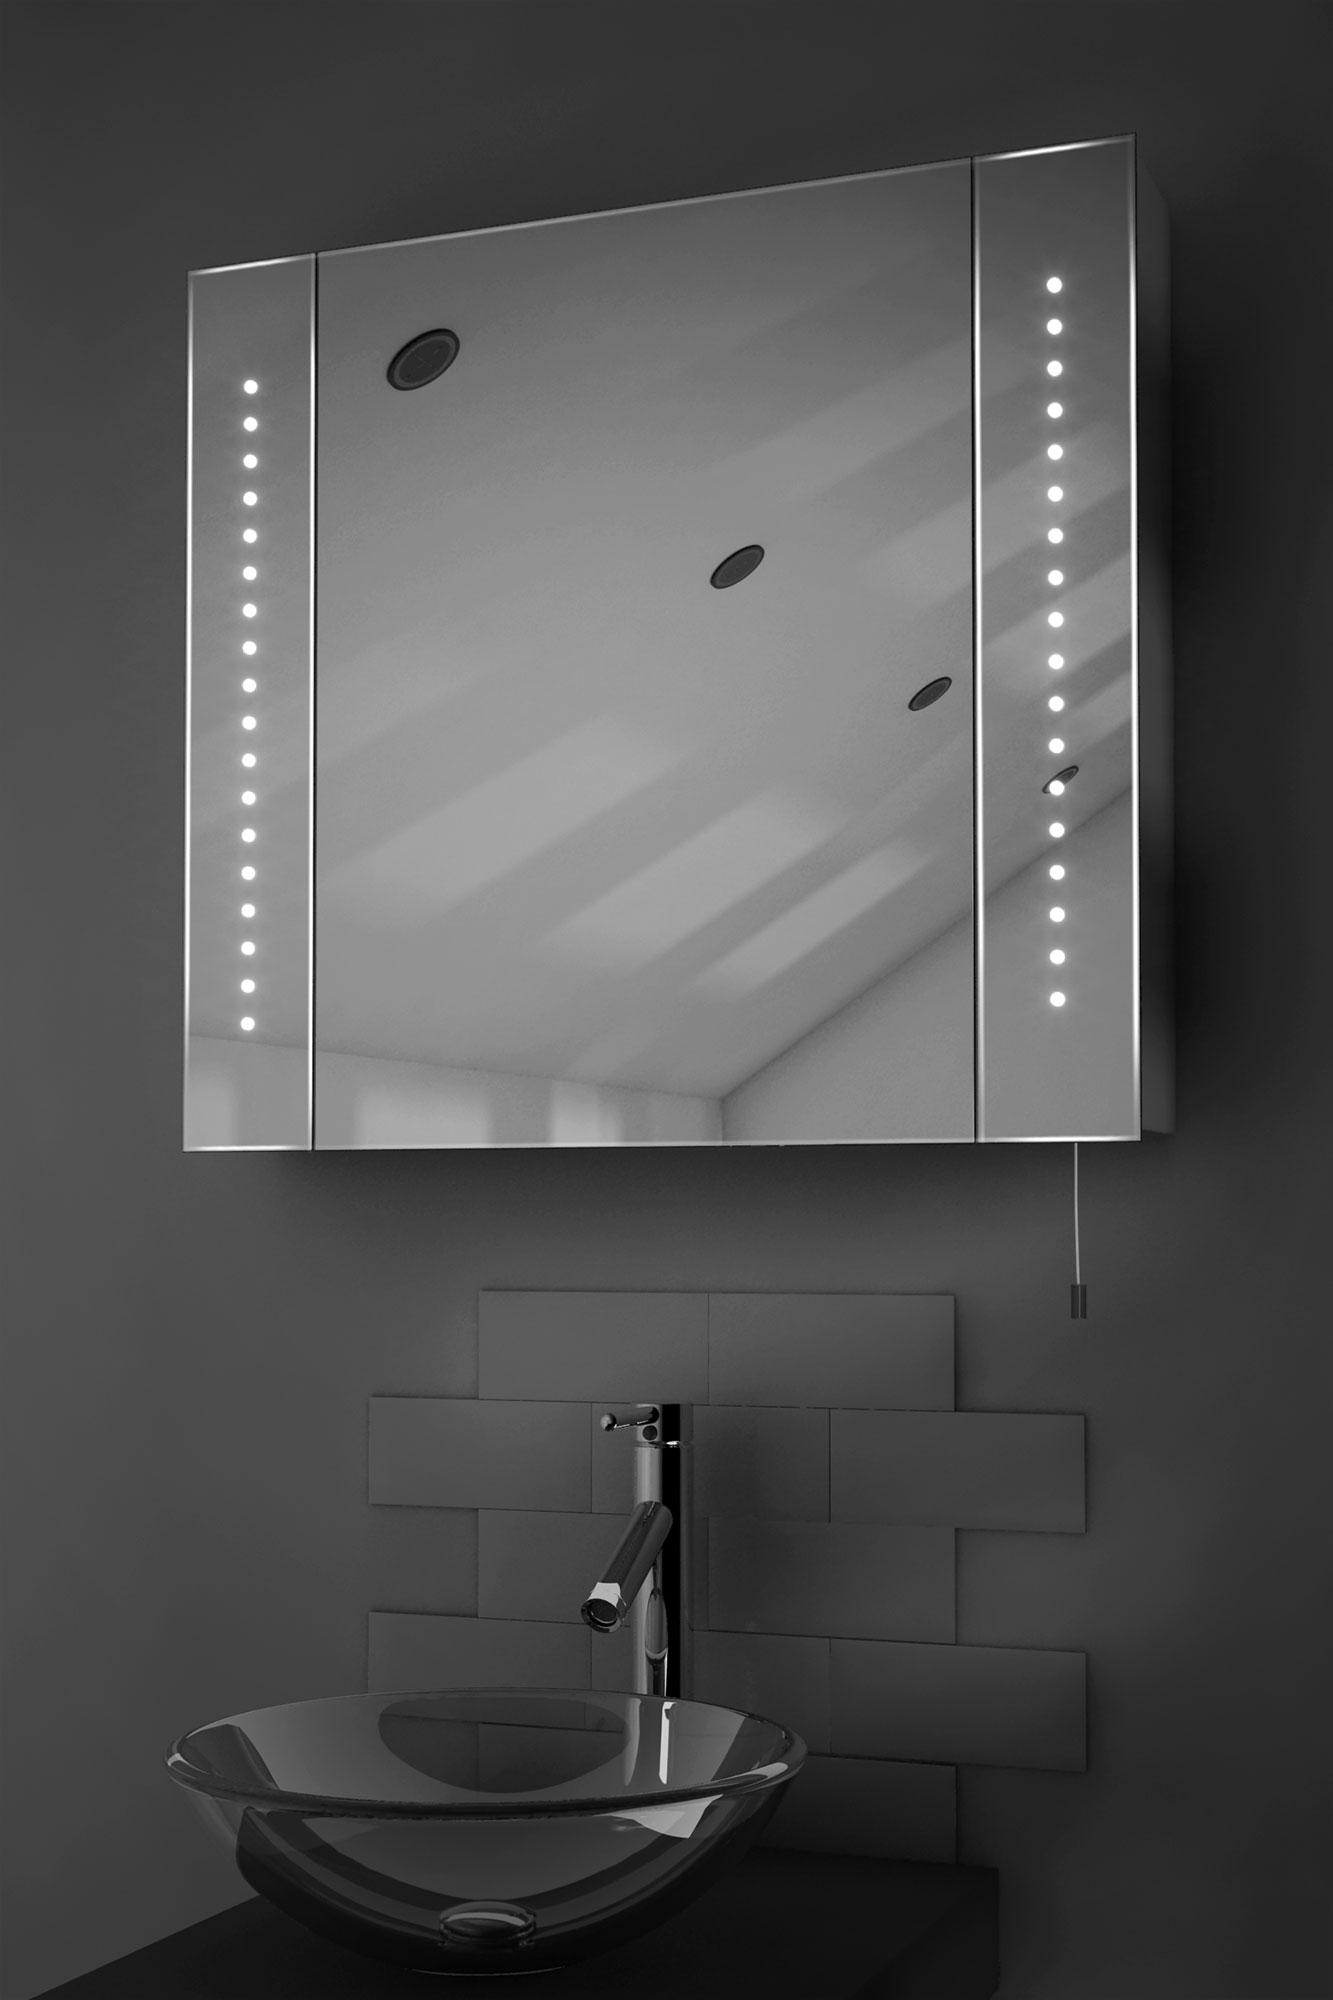 Bathroom Mirrors Illuminated: Regal LED Illuminated Battery Bathroom Mirror Cabinet With